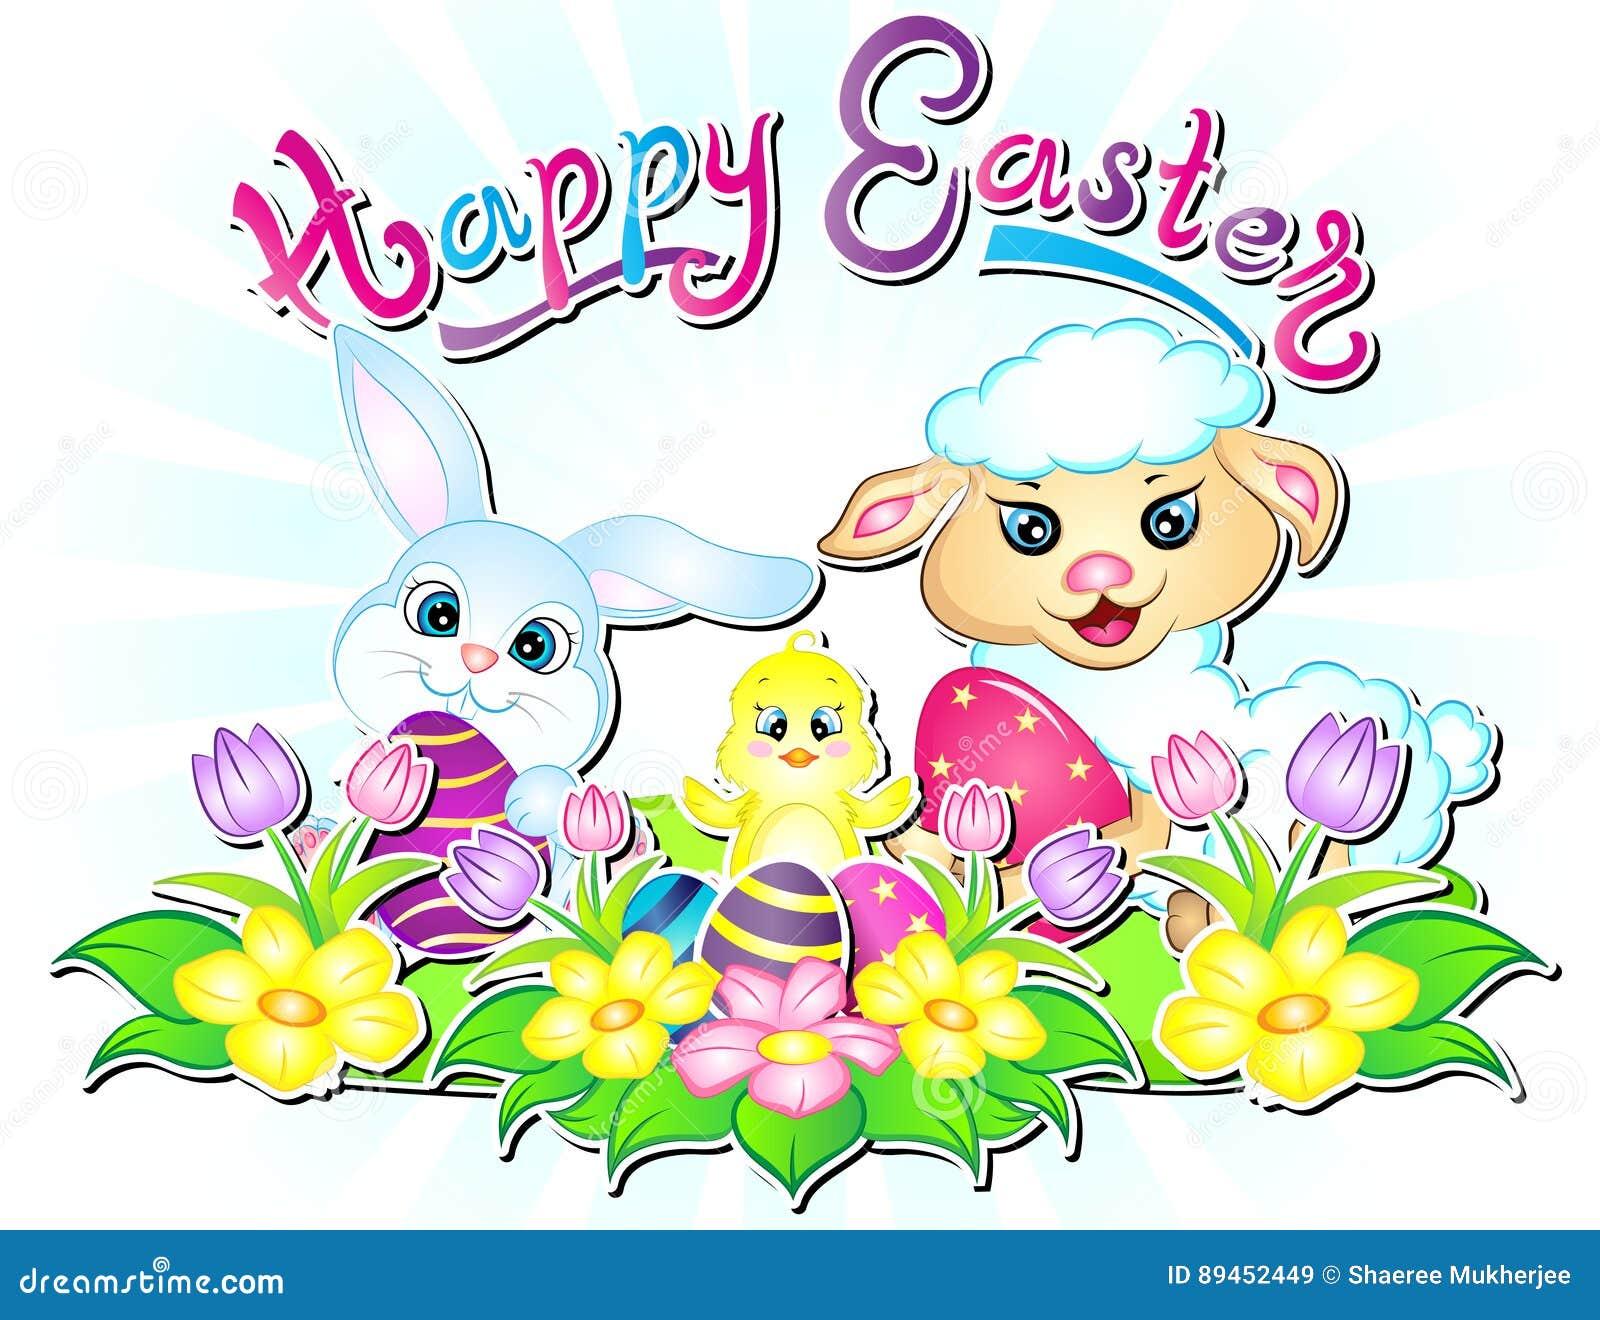 Happy Easter Wallpaper Illustration Stock Illustration